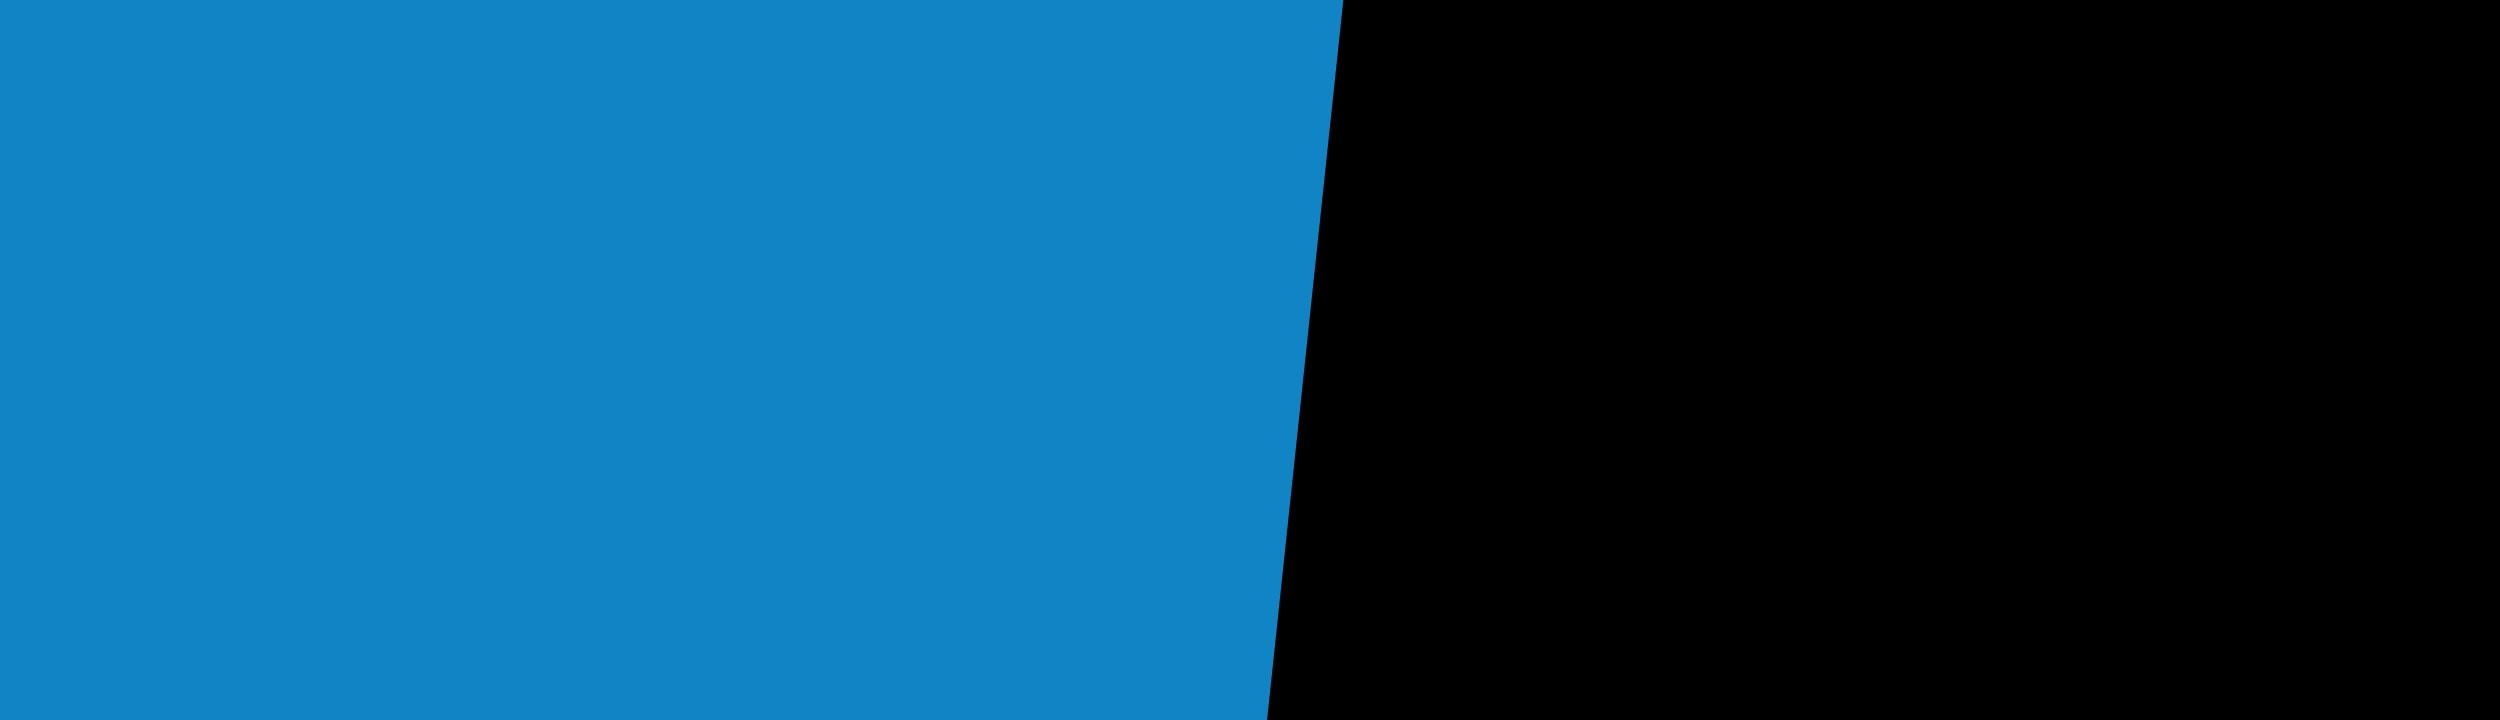 PWP Layerslider Homepage blackFR BG 2020 00